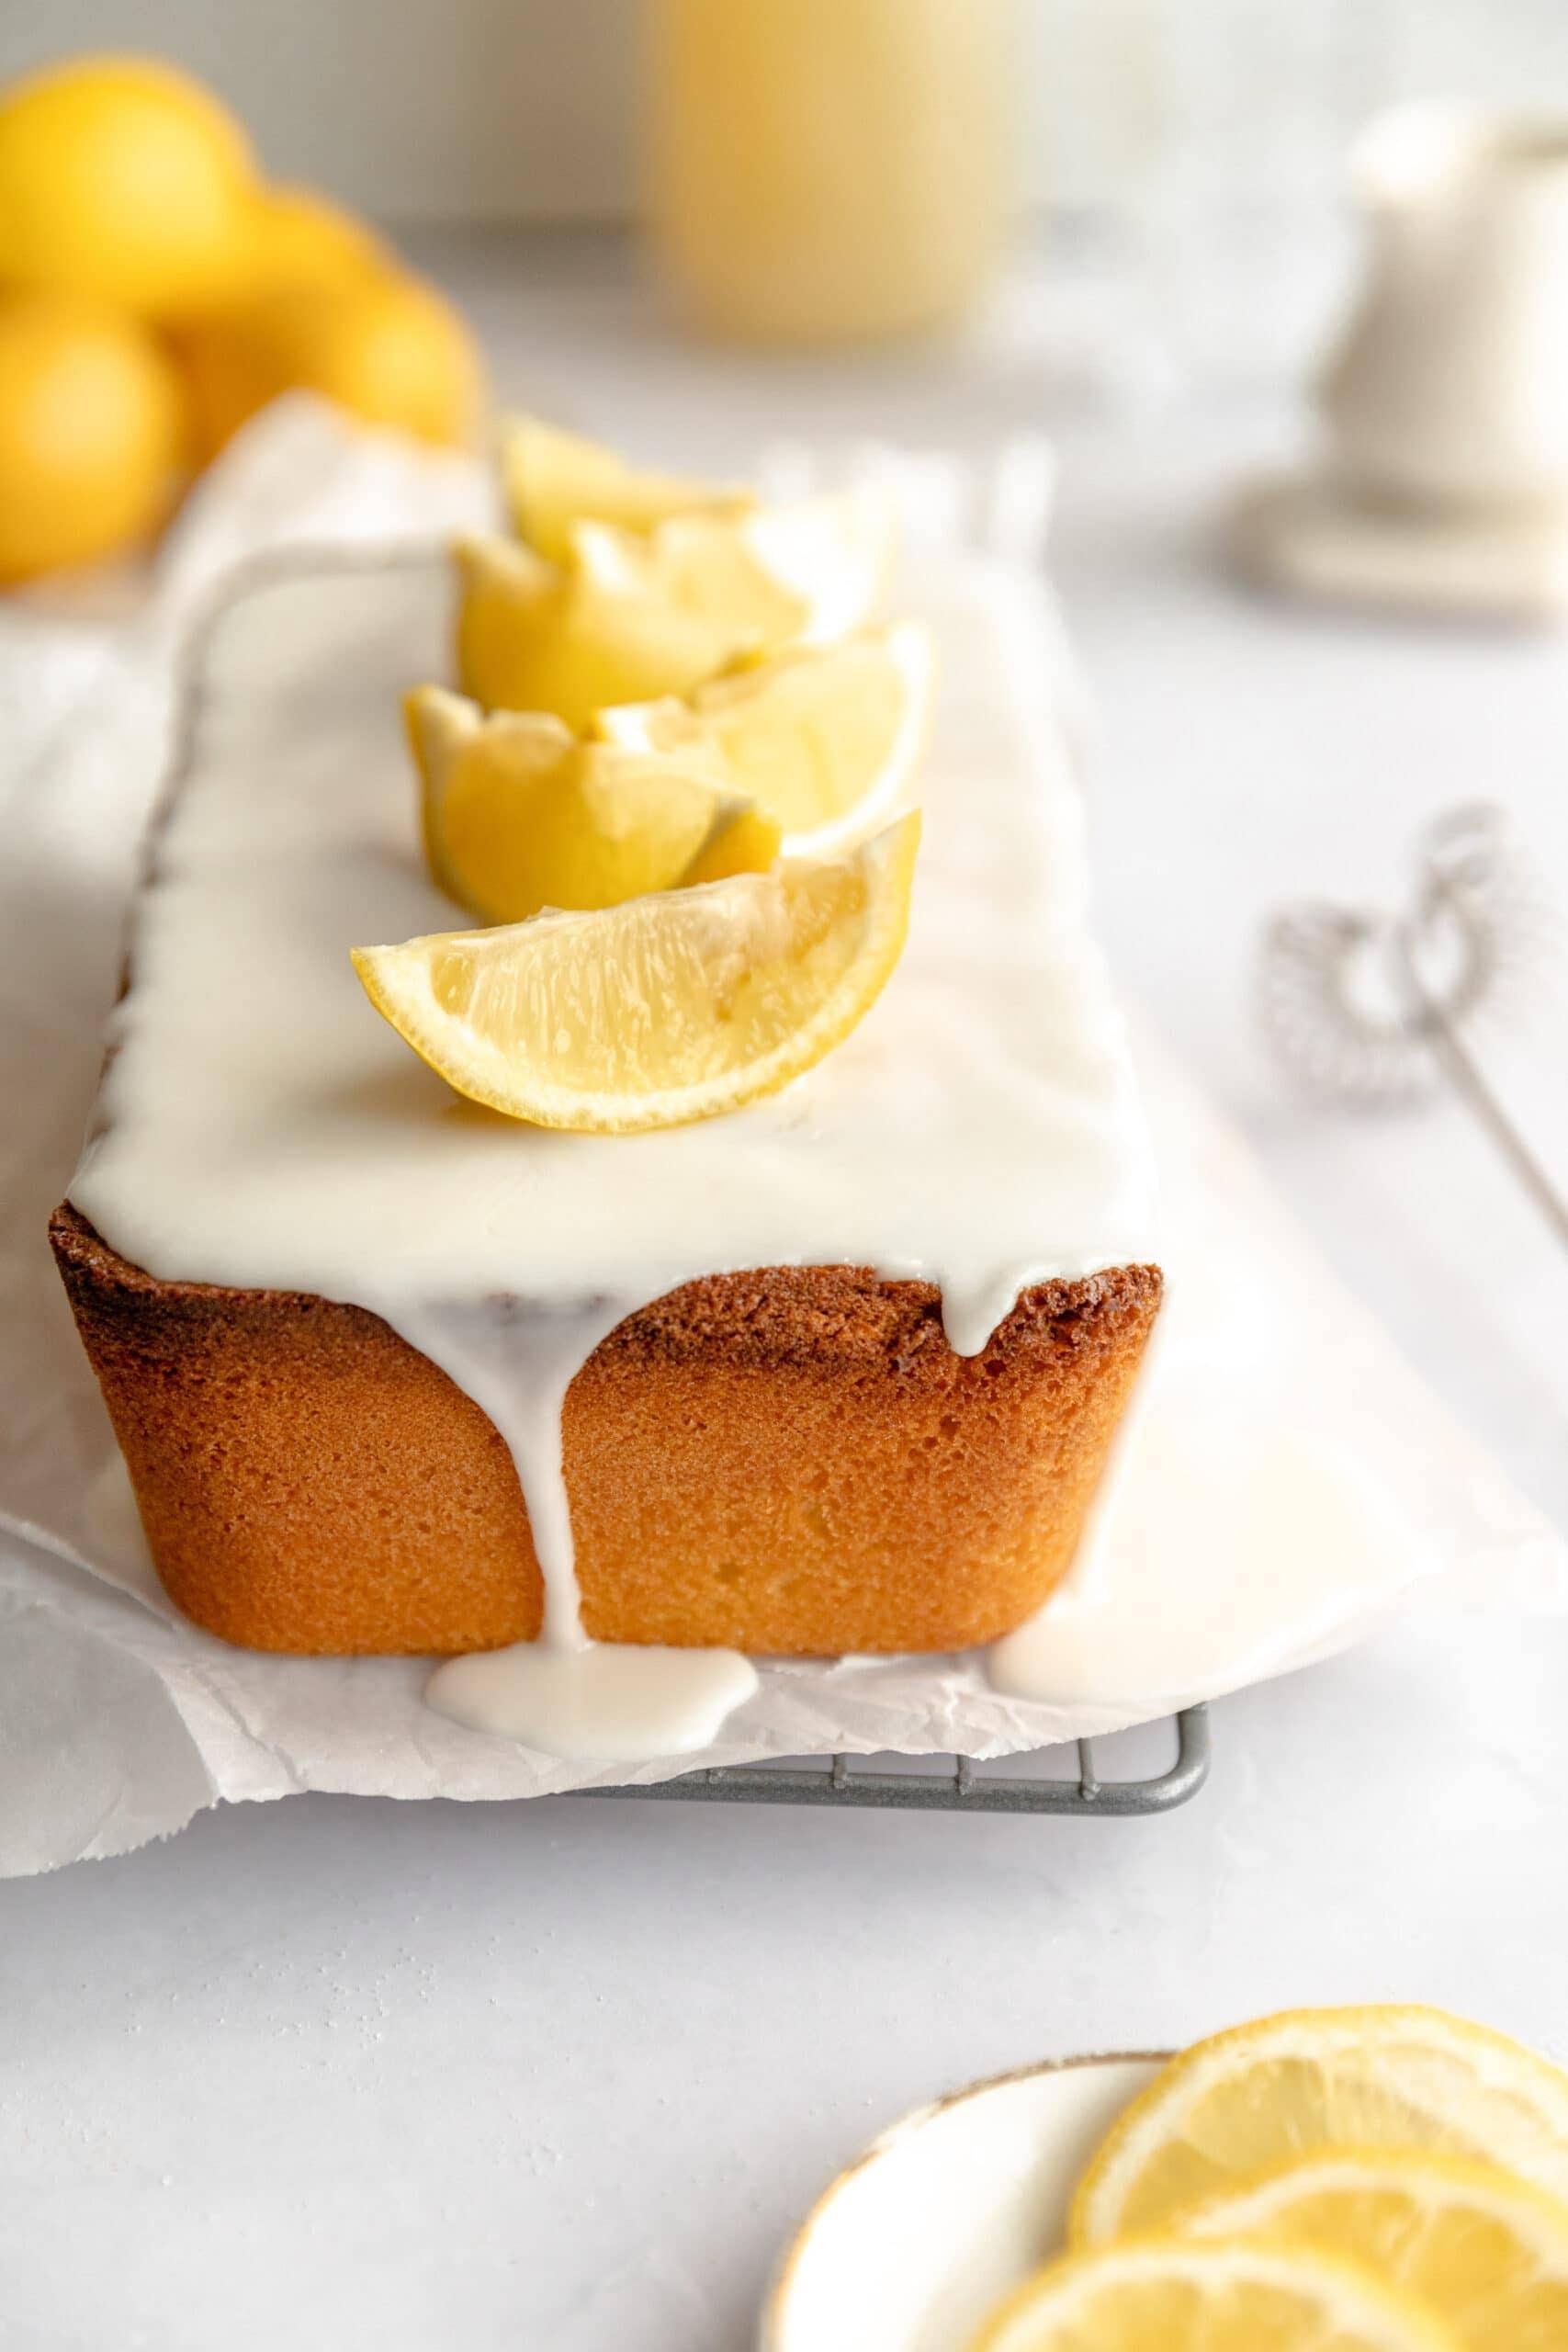 Sandkuchen (Lemon loaf cake) glazed with a lemon glaze and topped with lemon wedges.